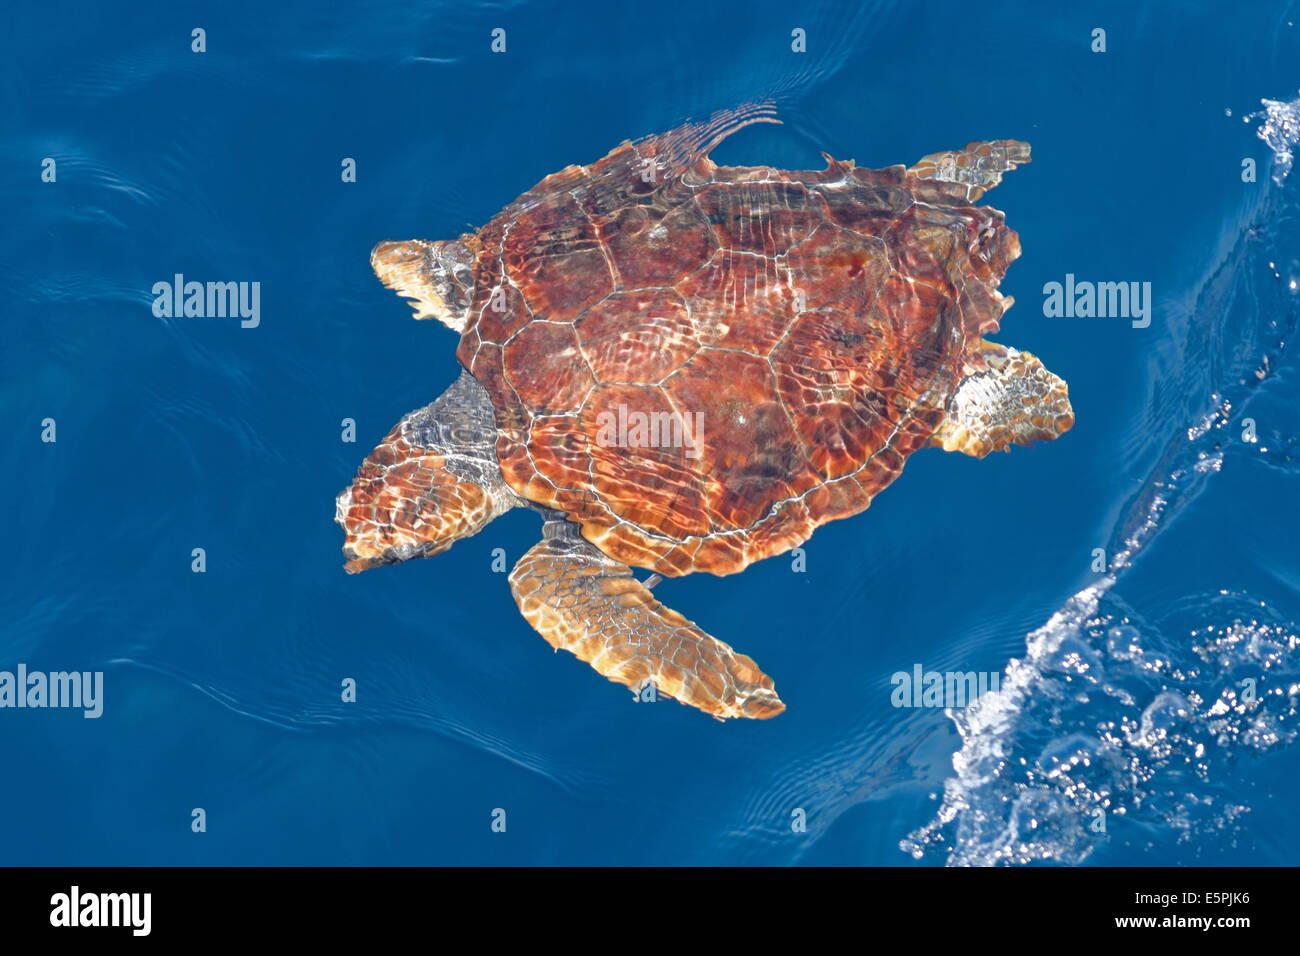 Juvenile loggerhead turtle (Caretta caretta), oceanic stage, below surface in deep water, Northeast Atlantic, offshore Morocco Stock Photo